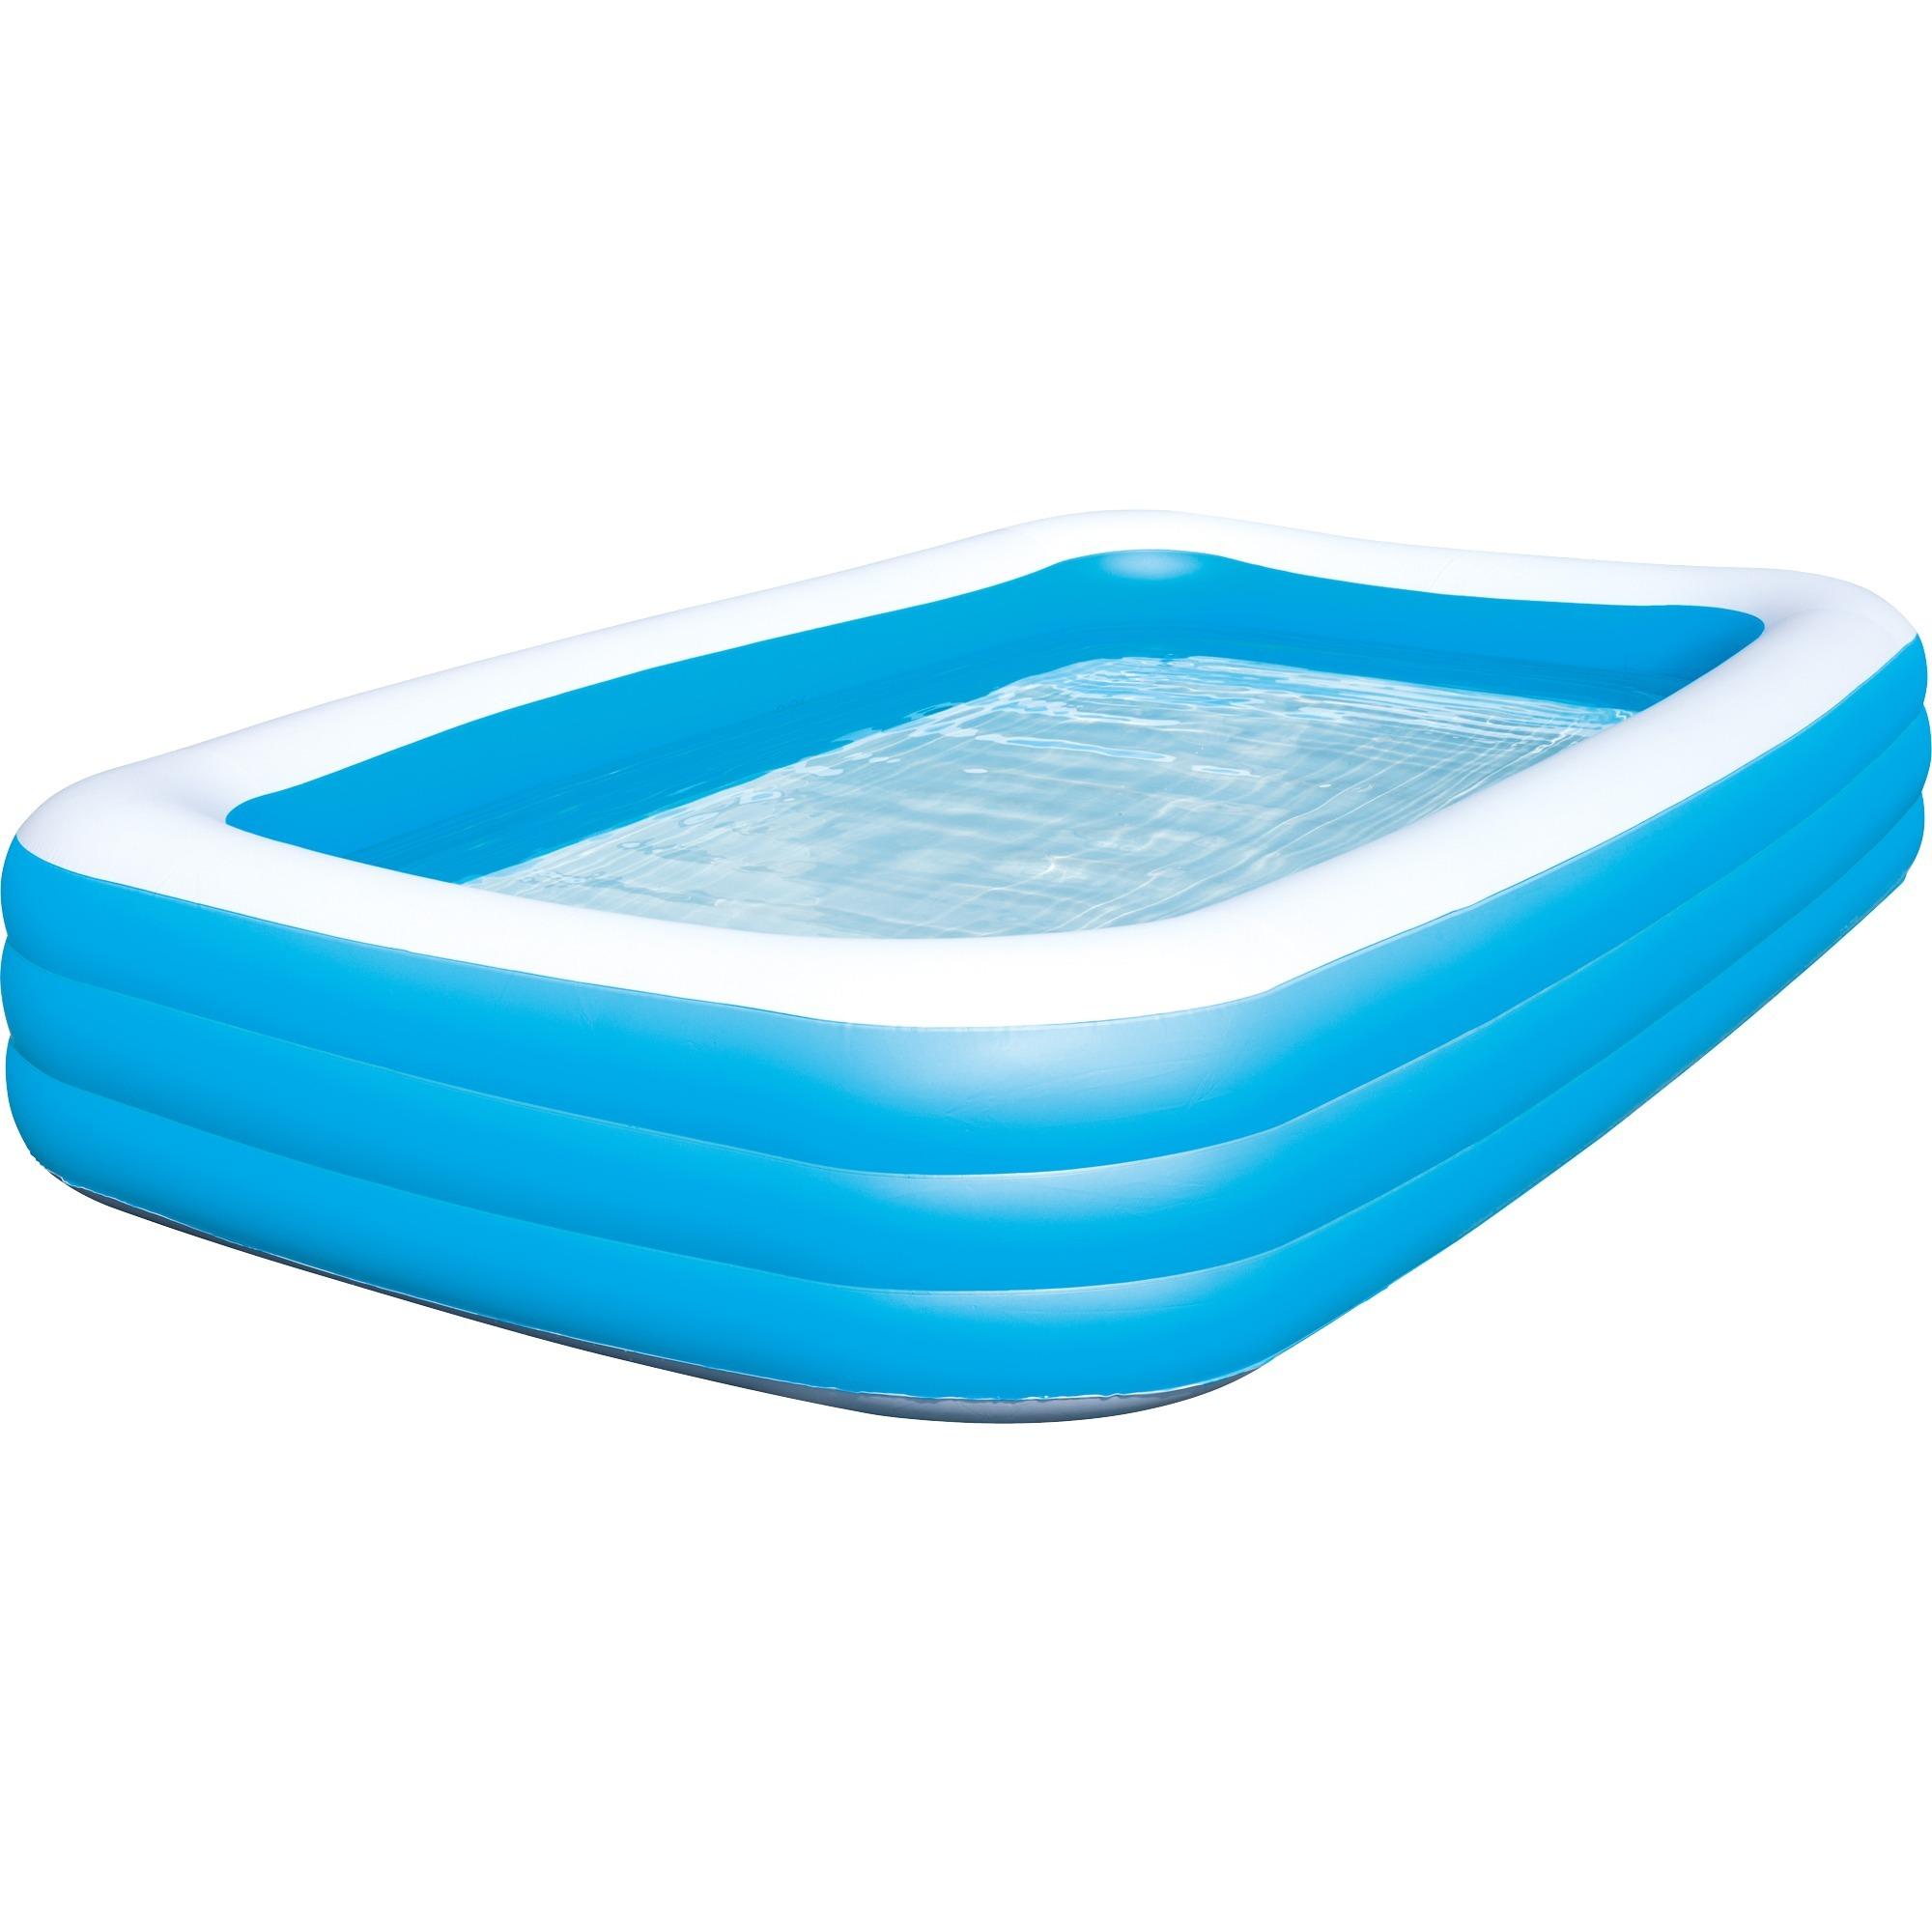 54009-1161l-vinyl-legebassin-til-born-swimming-pool